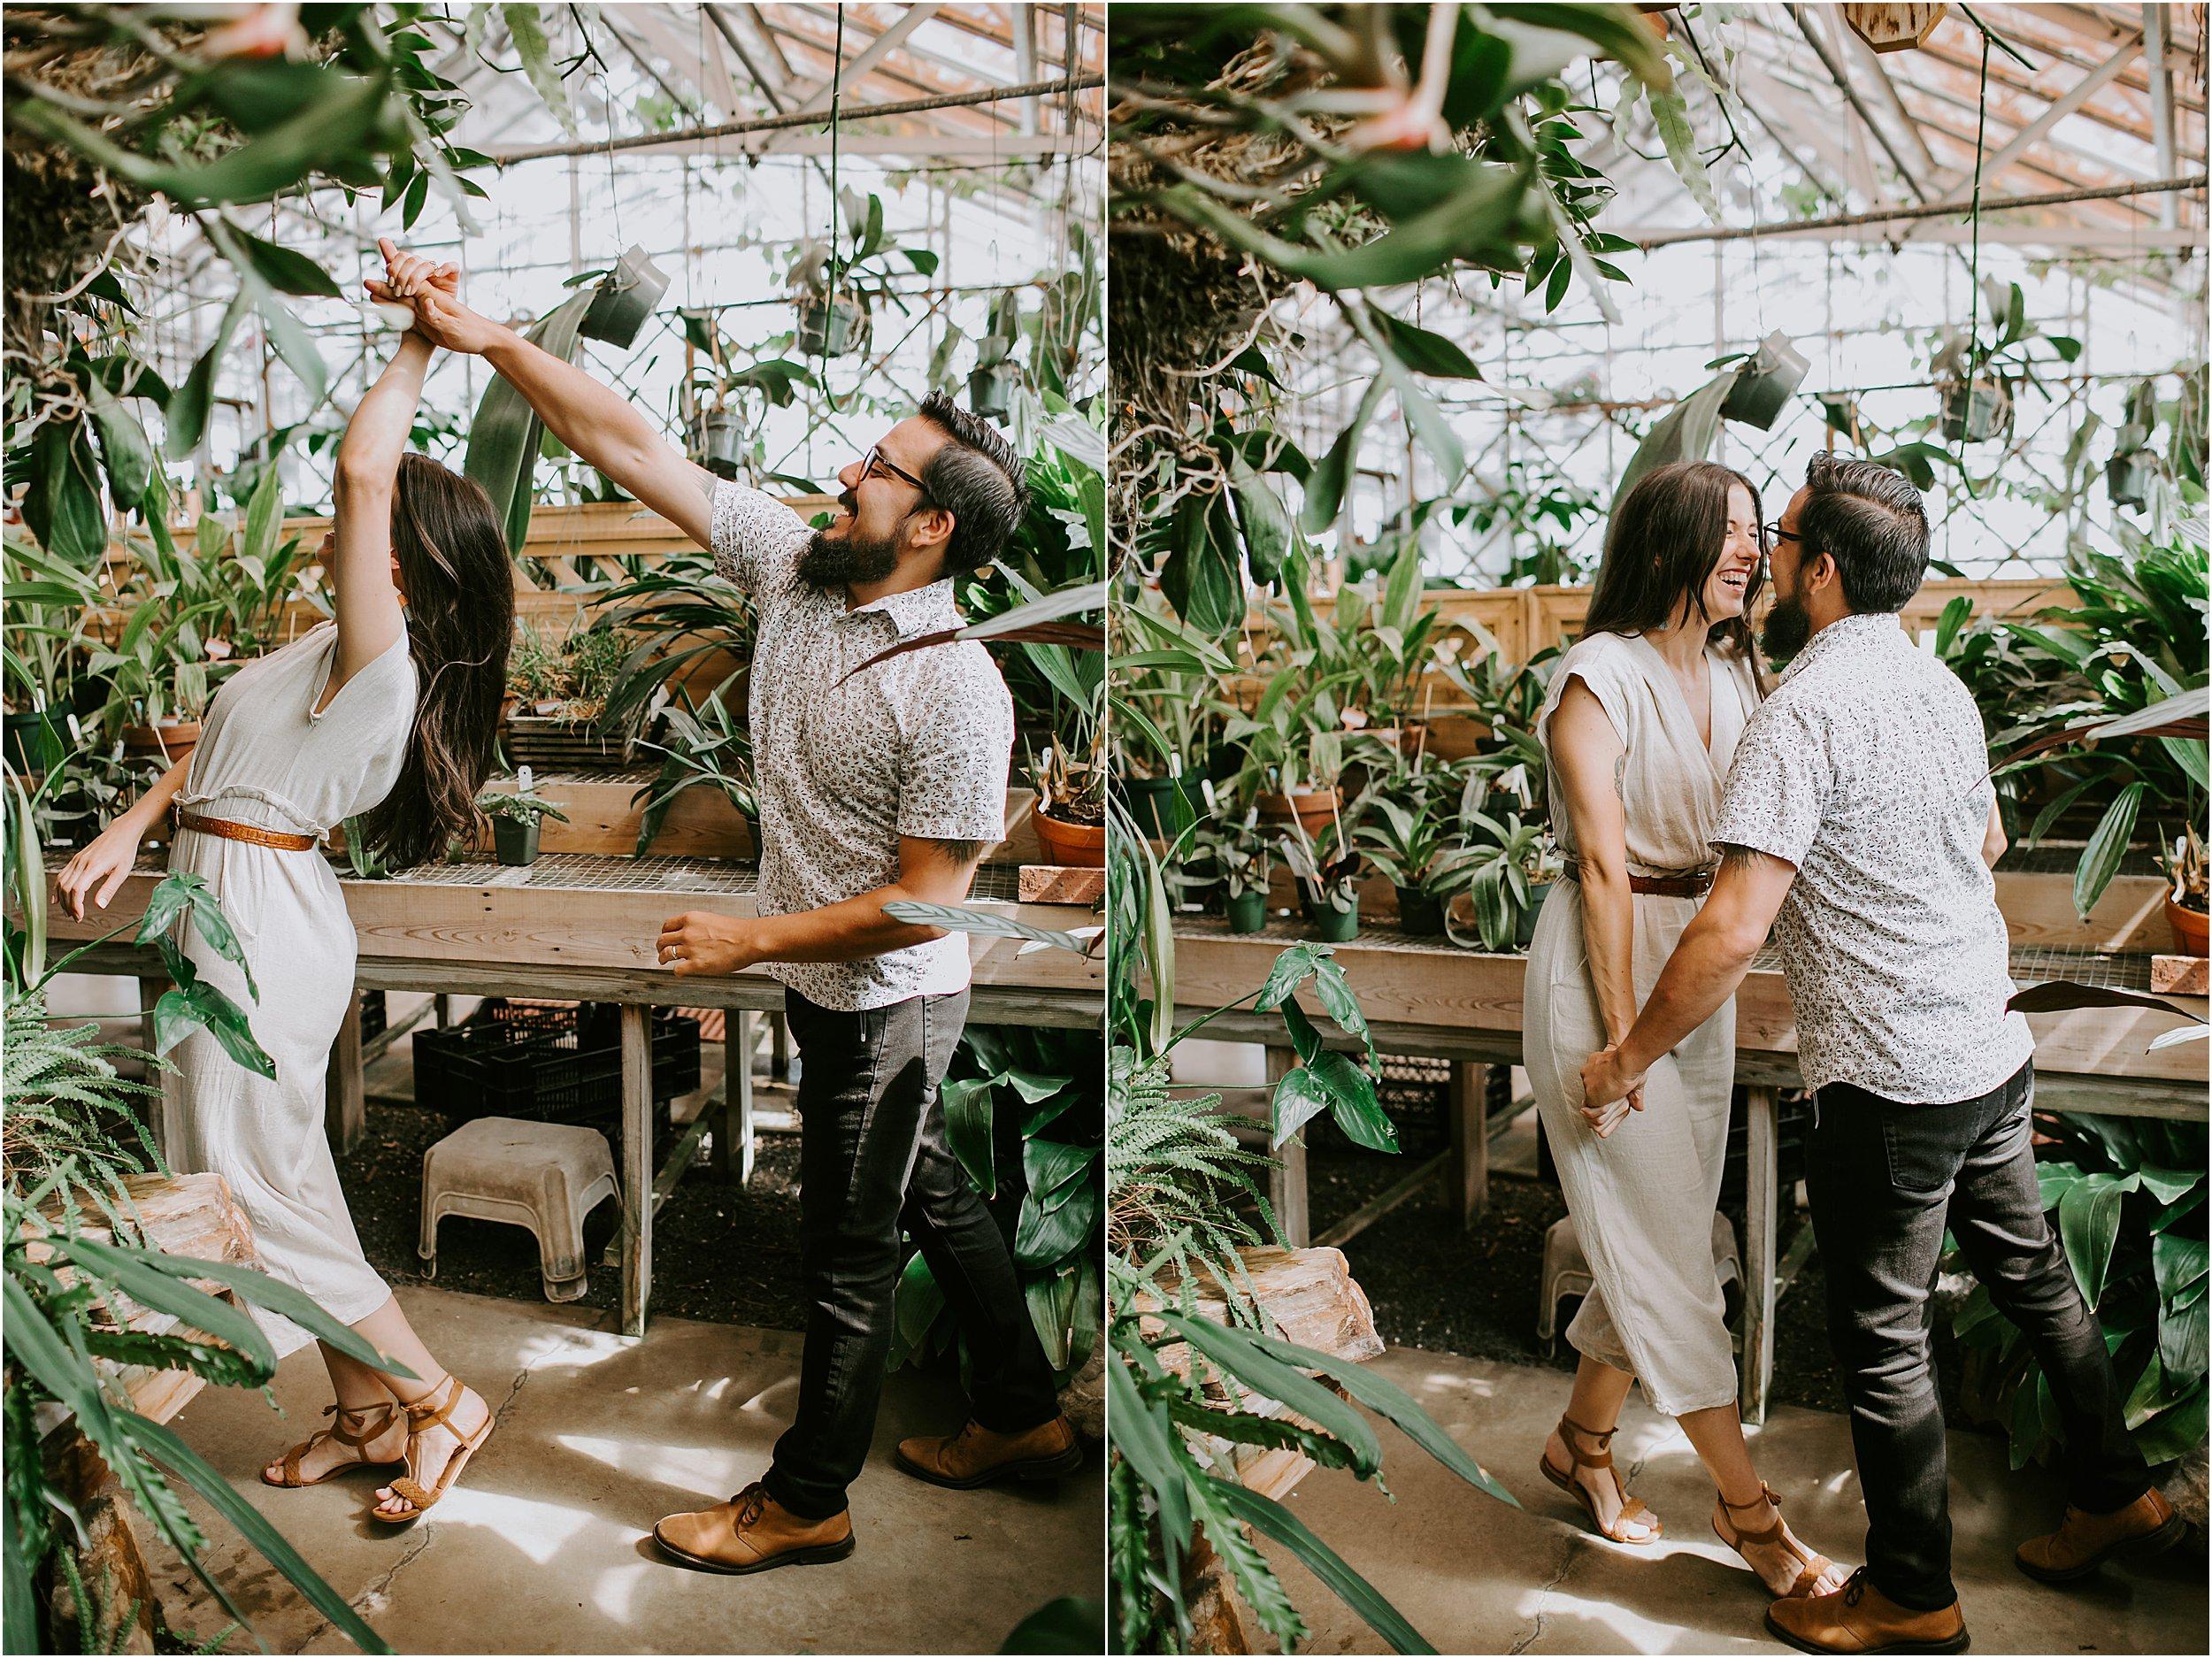 Greenhouse-Adventure-Session_006.jpg